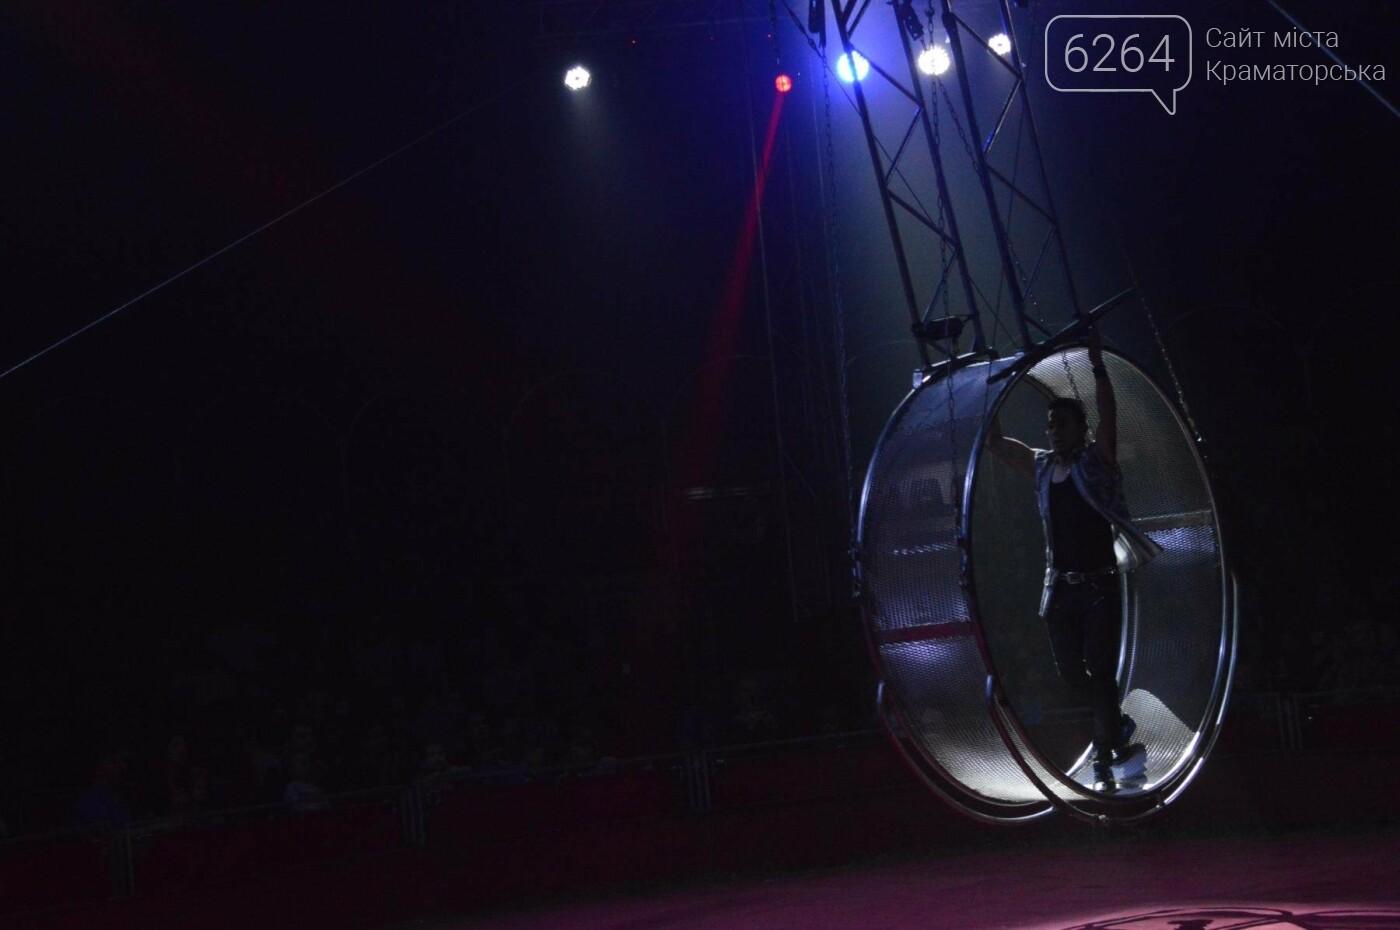 Новое шоу цирка «Кобзов» произвело фурор в Краматорске, фото-8